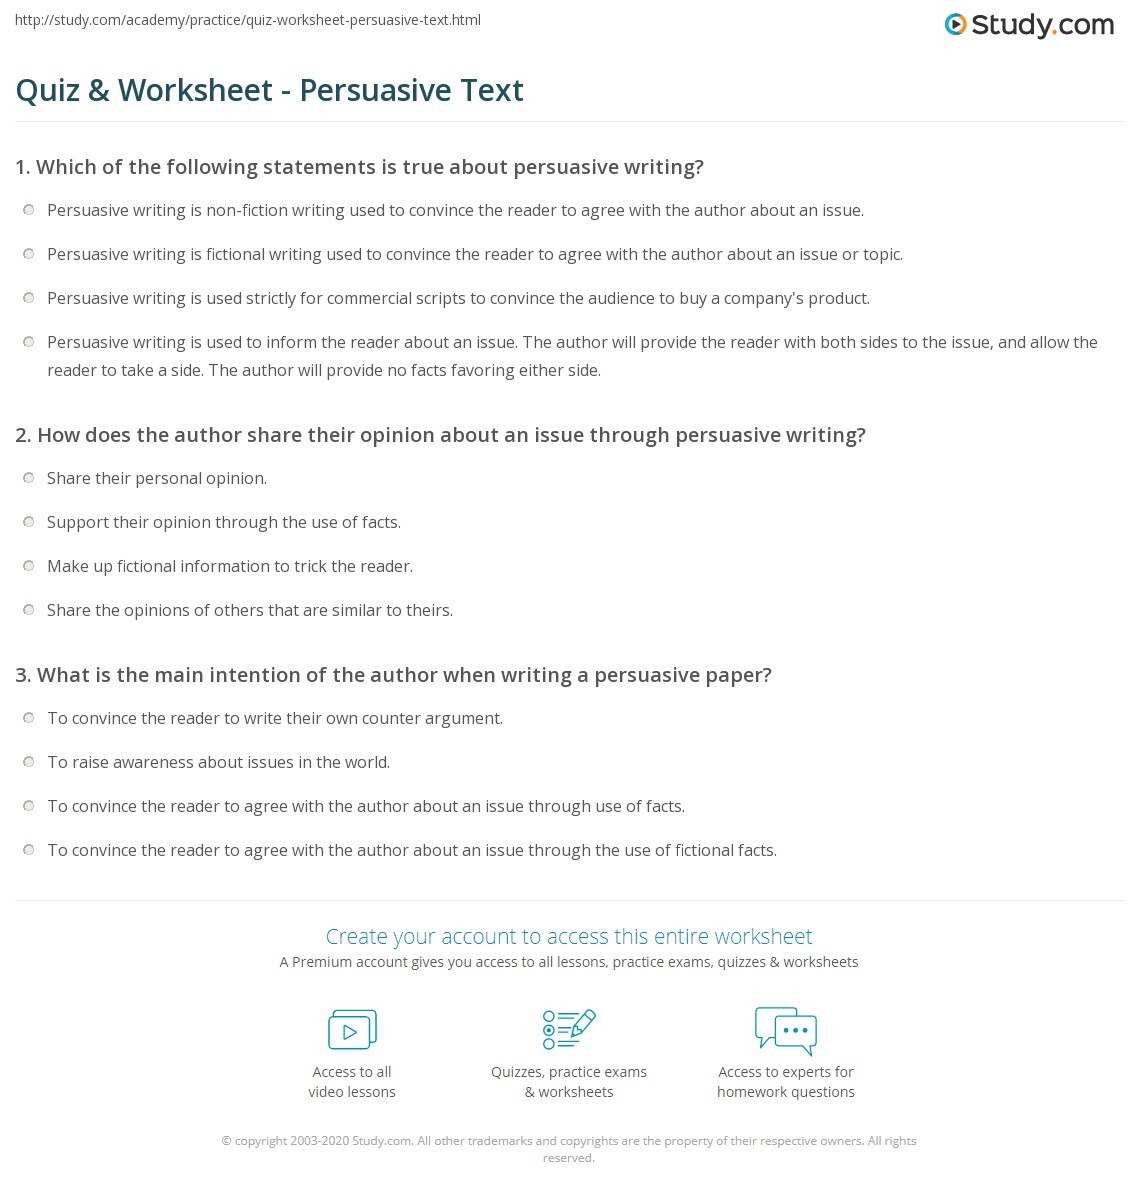 hight resolution of Quiz \u0026 Worksheet - Persuasive Text   Study.com